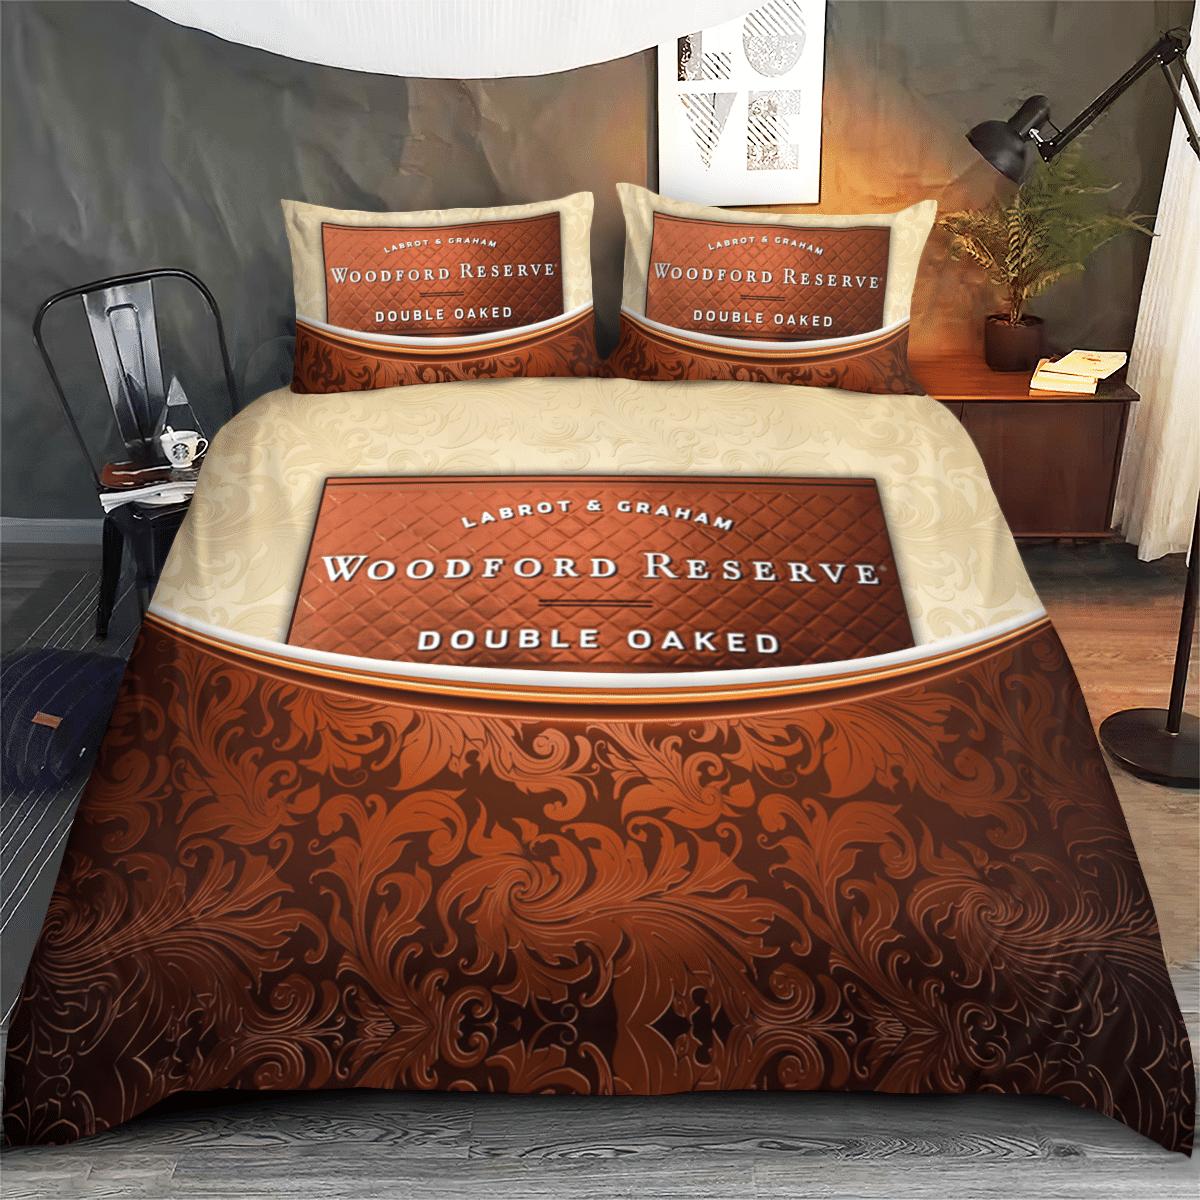 Labrot and Graham Vintage Bedding Set